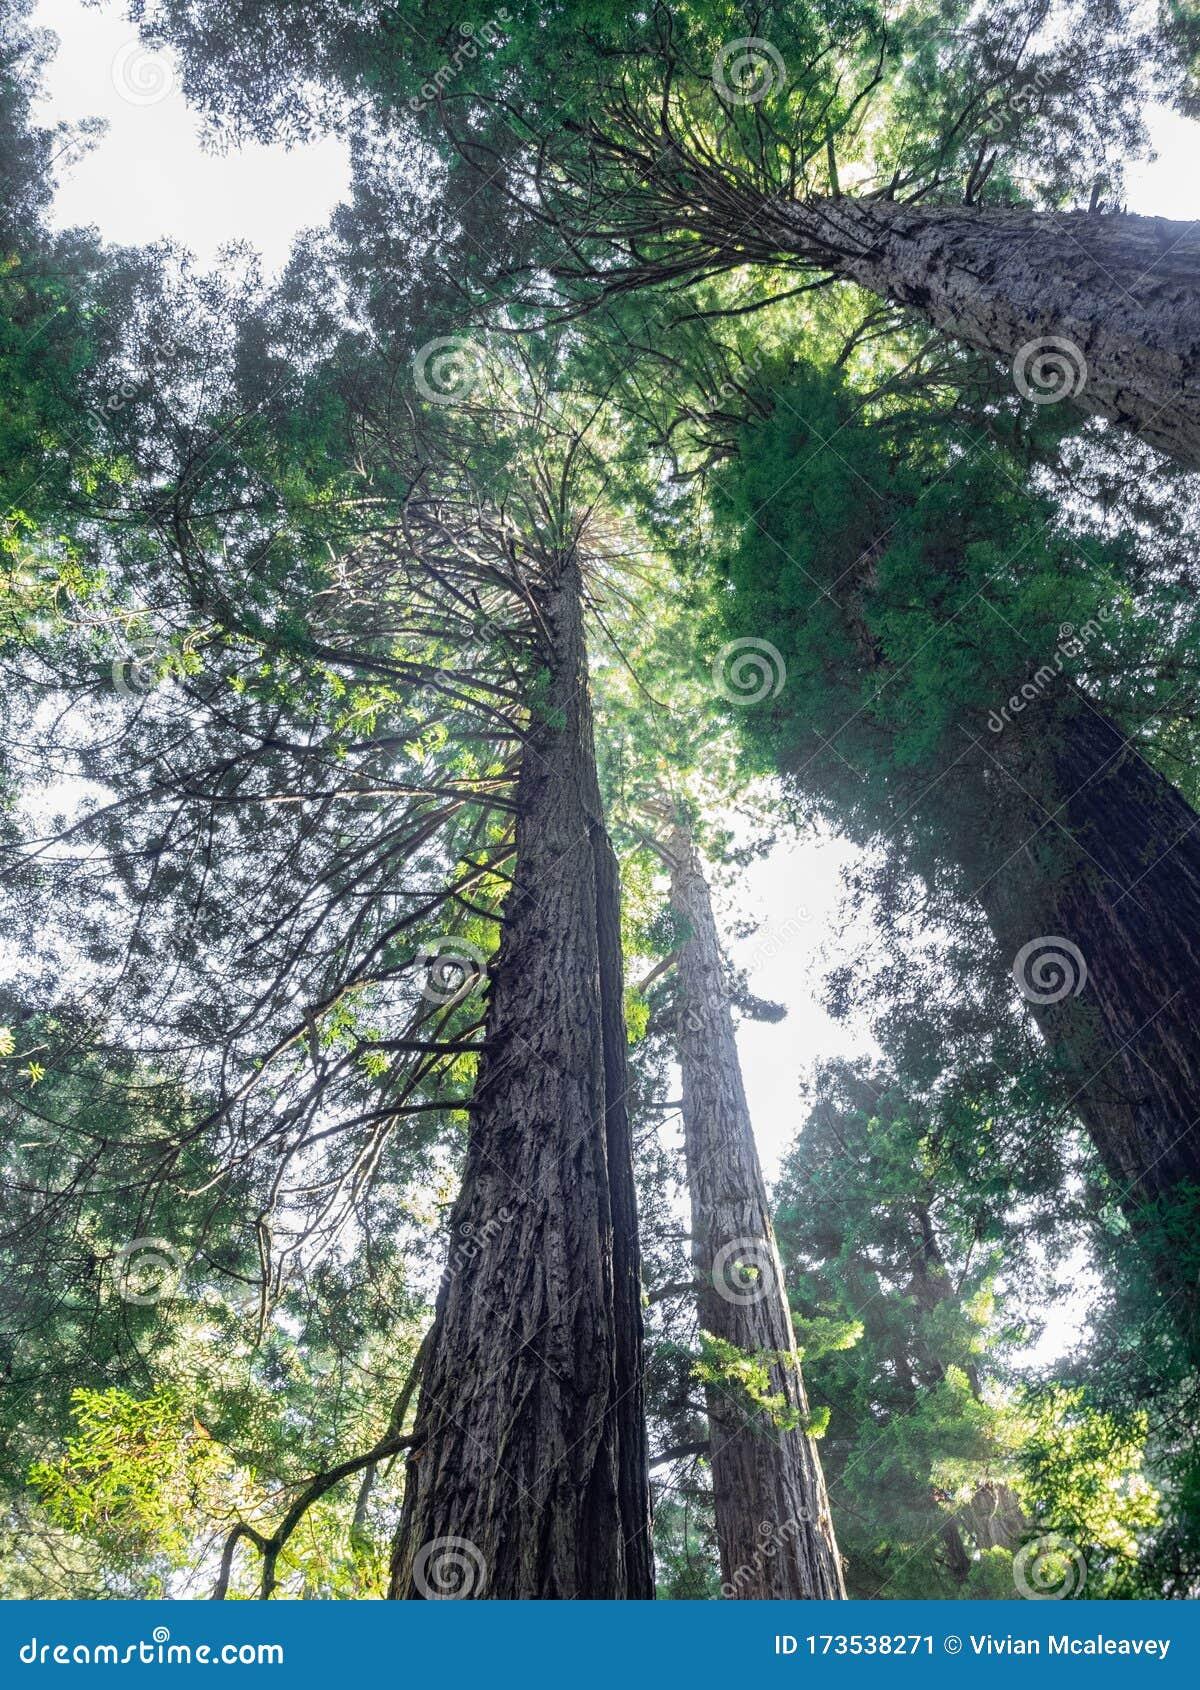 Bosque De Secuoya Imagen De Archivo Imagen De California 173538271